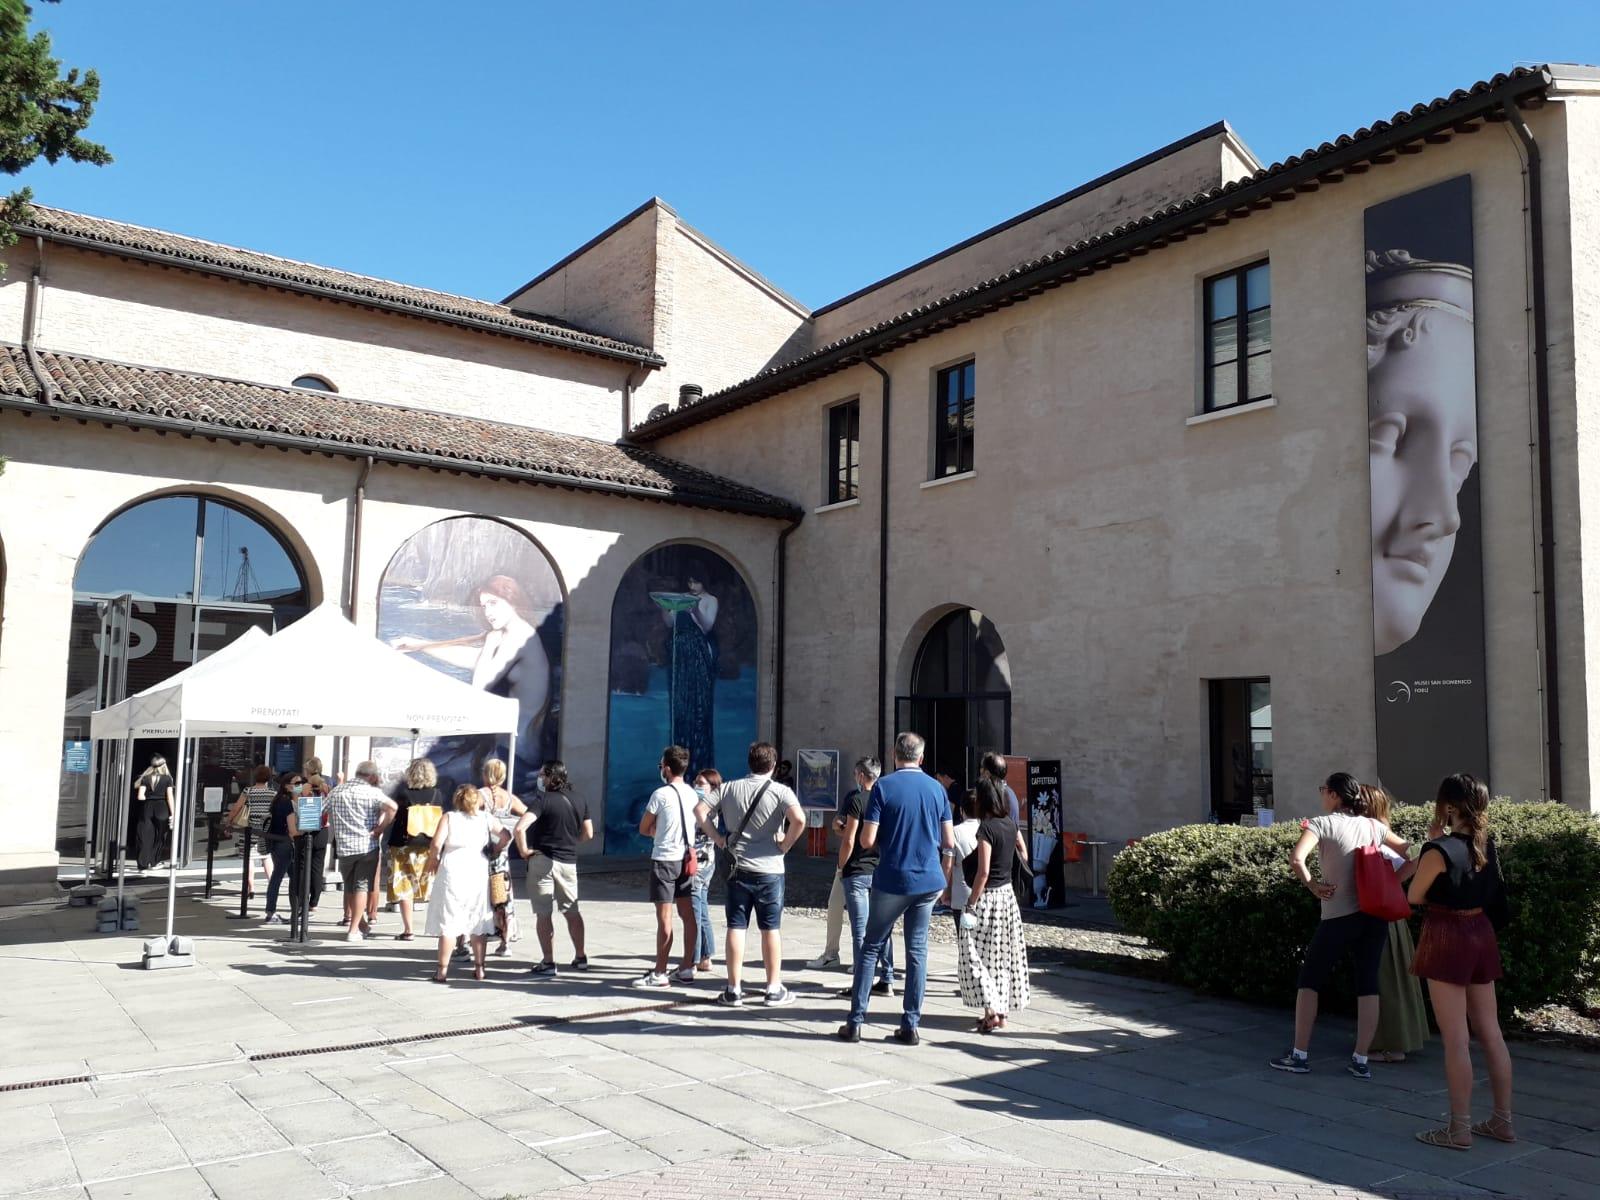 Mostra Ulisse visitatori in ingresso Musei San Domenico